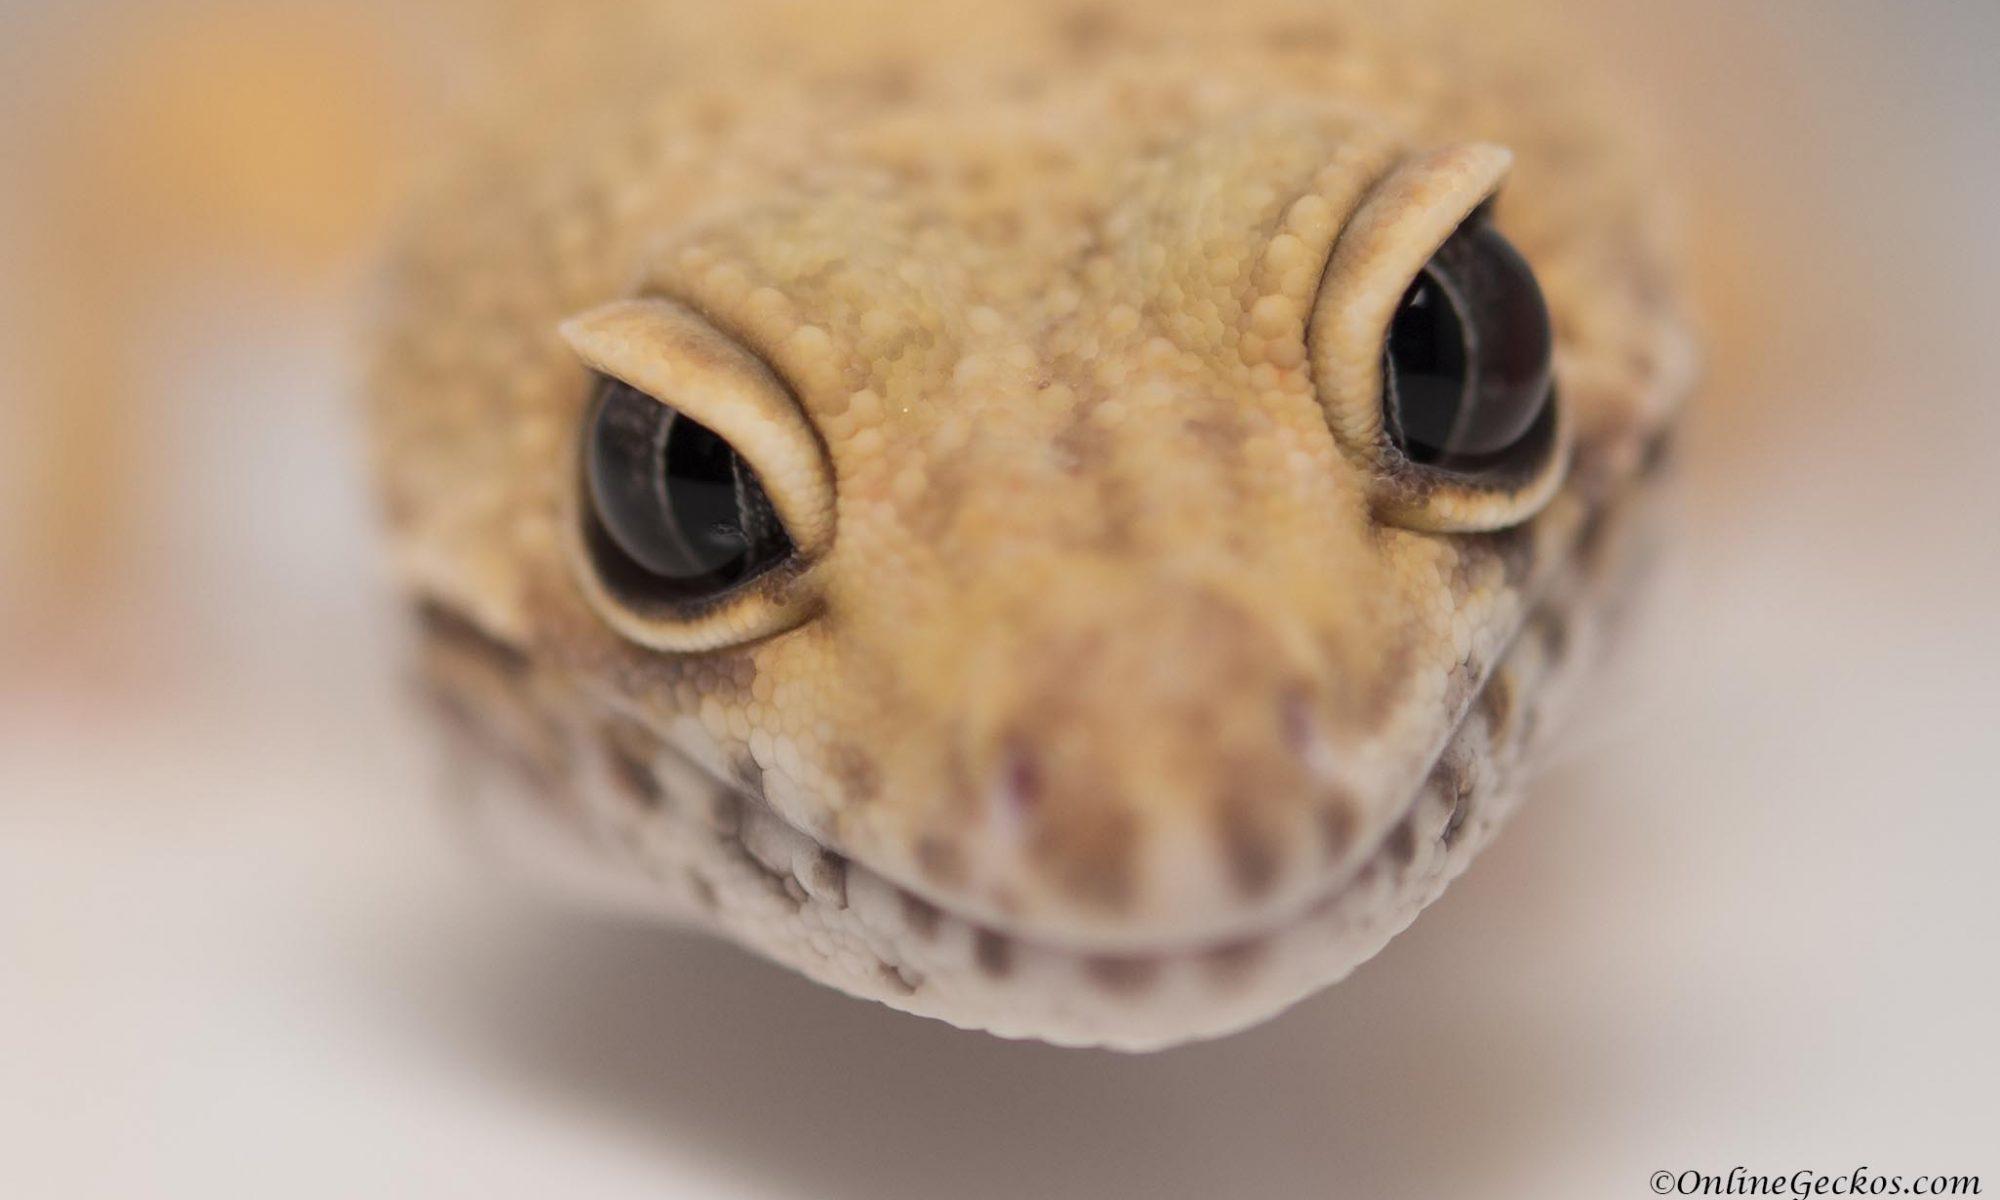 do leopard geckos bite? onlinegeckos super hypo tangerine carrot-tail baldy